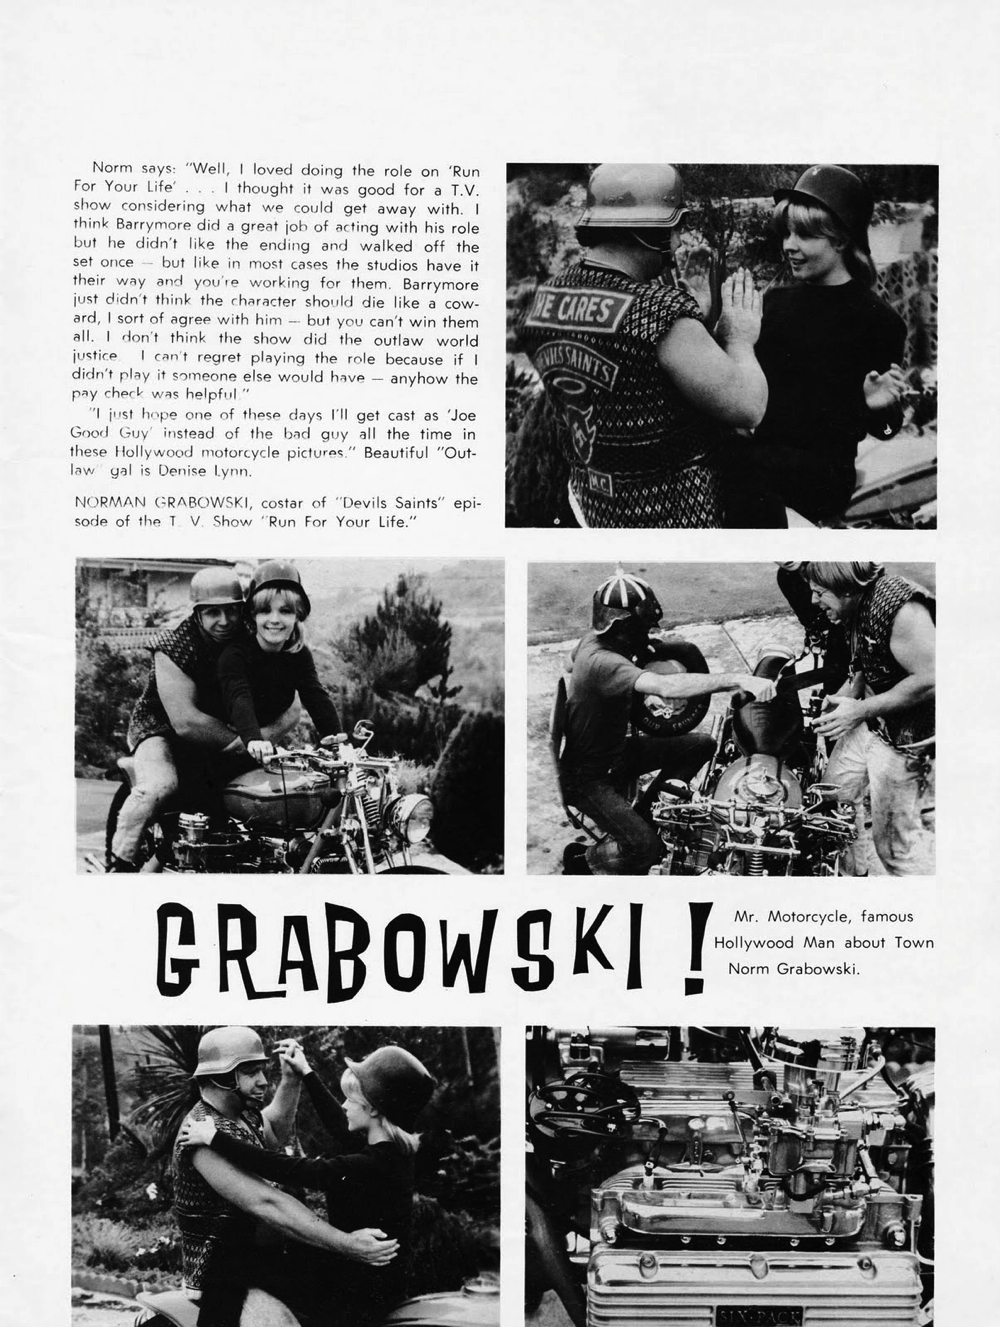 NORM GRABOWSKI'S CUSTOM CORVAIR BIKE   SICK-AS-HELL SIX